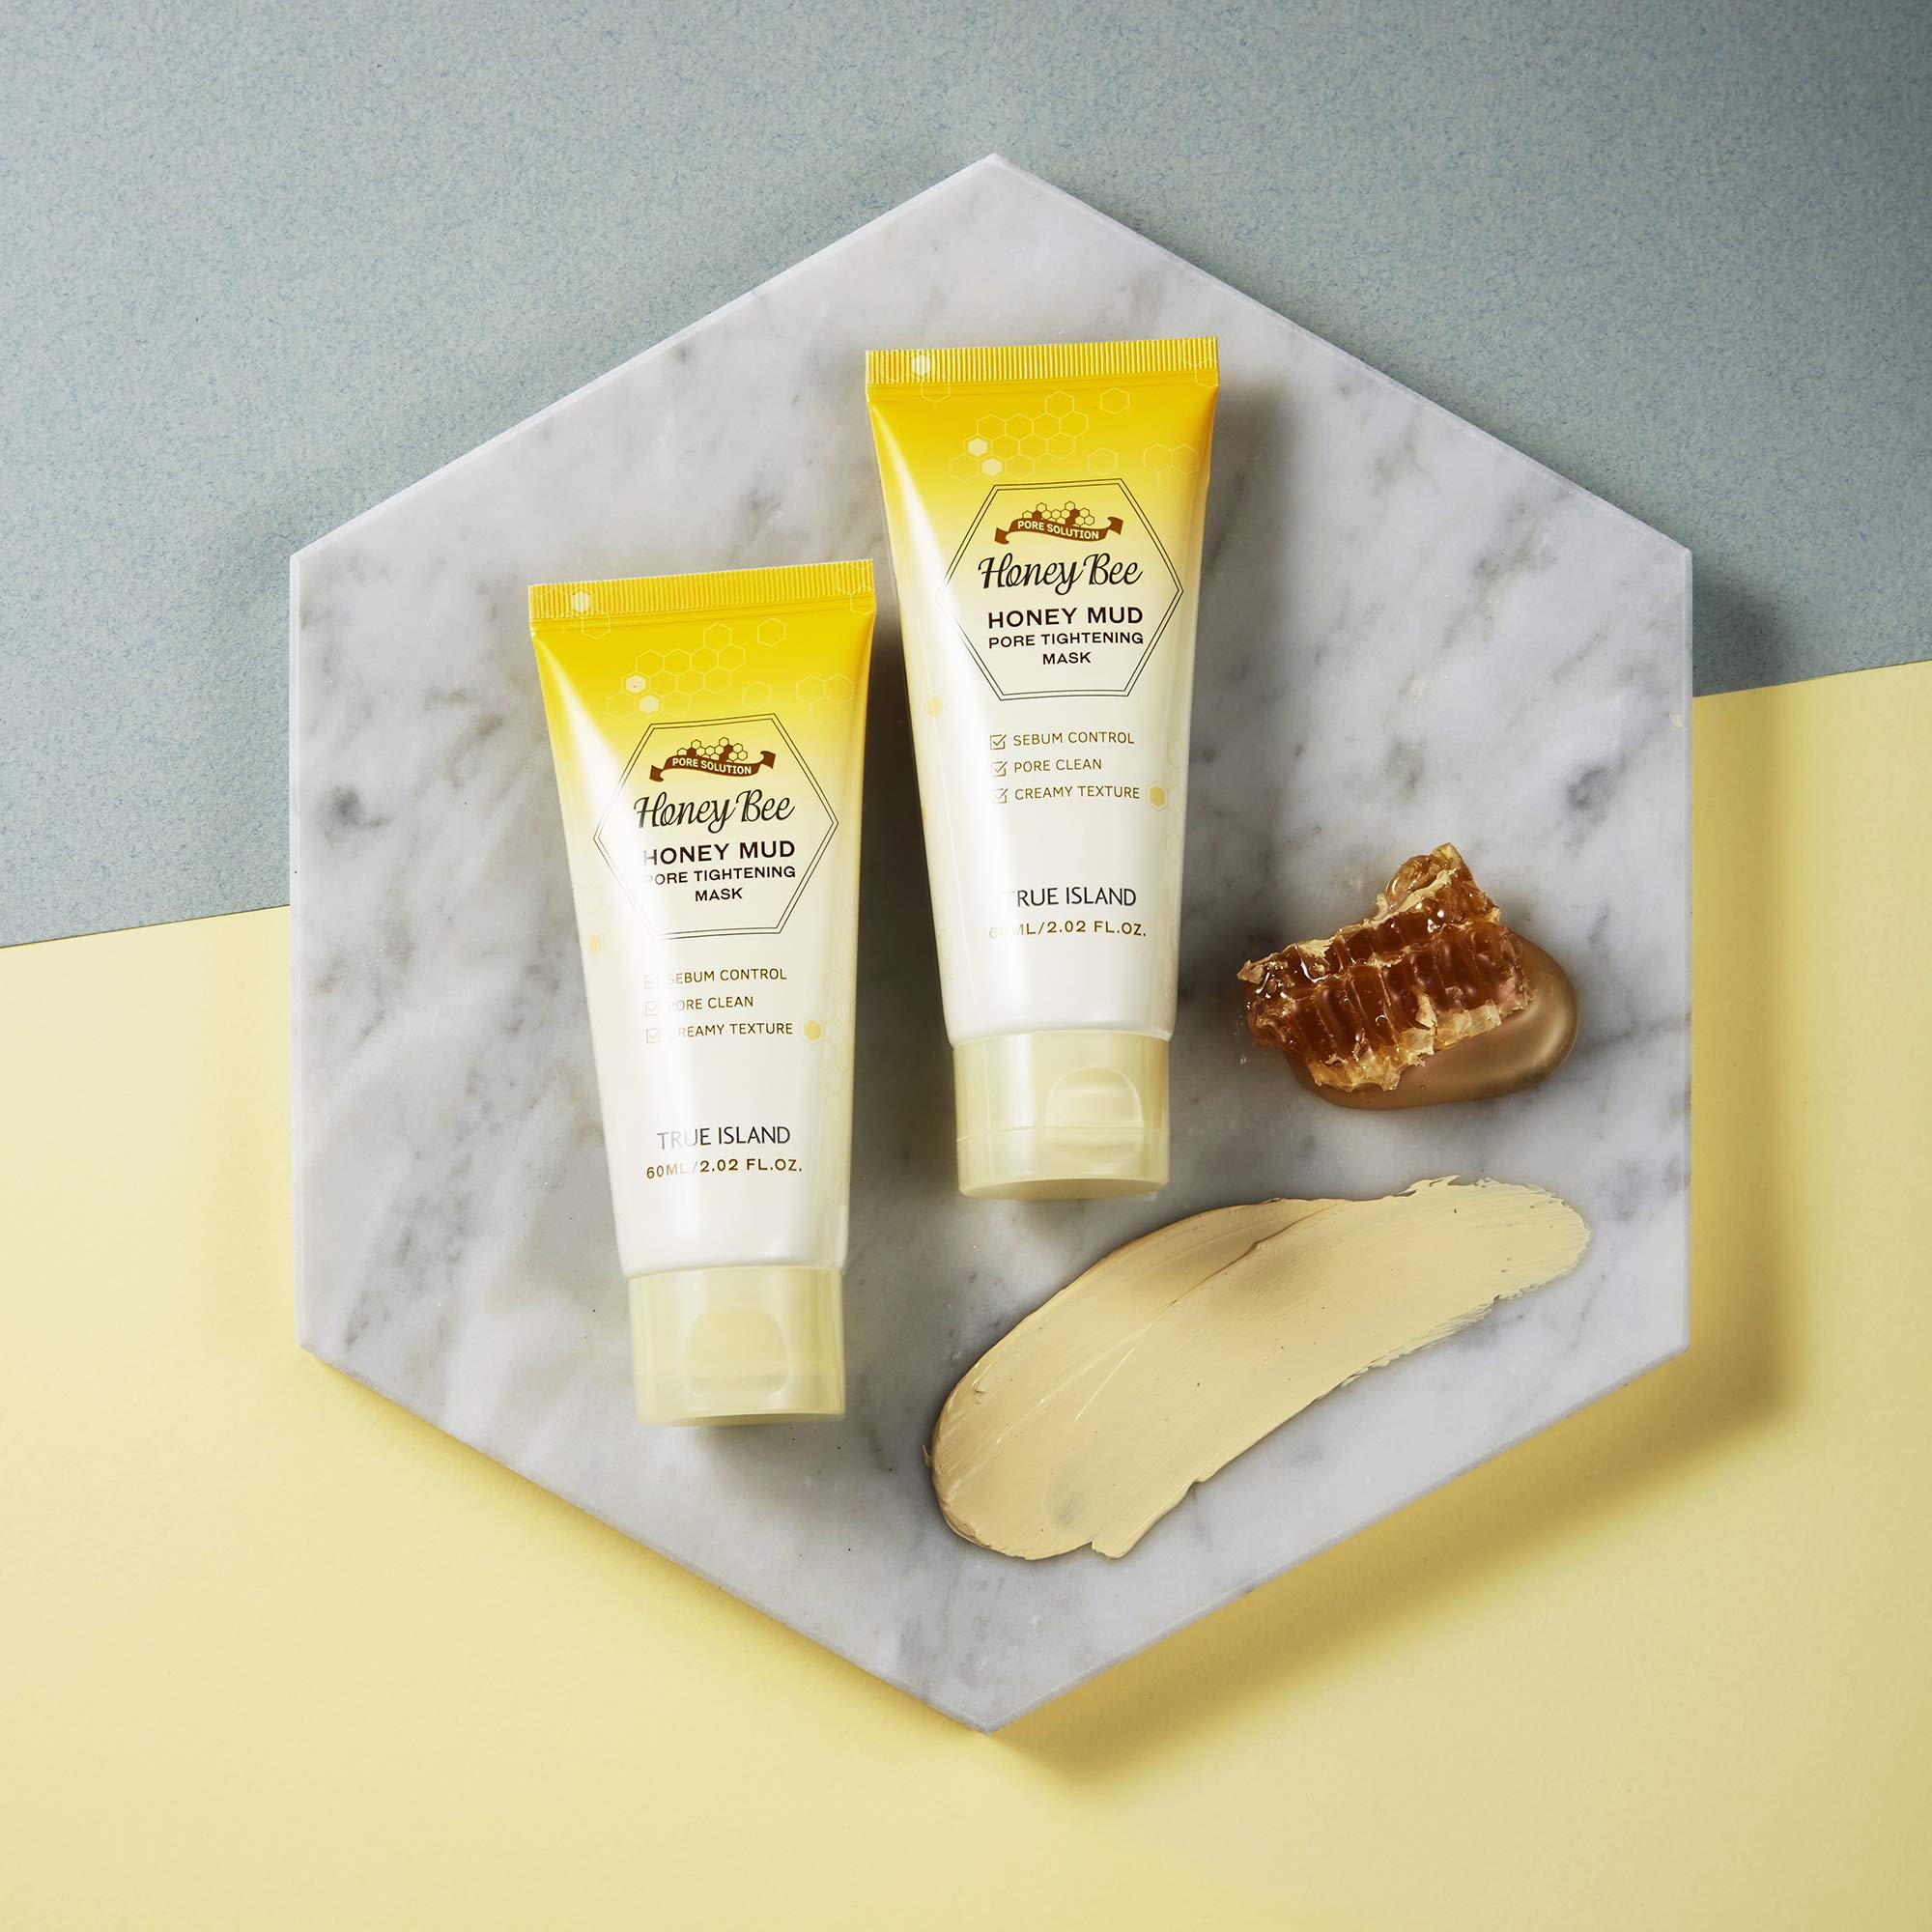 [TRUE ISLAND] Honey Bee Honey Mud Pore Tightening Mask (2.02 fl oz) / Korean Pore Therapy with Jeju Island Volcanic Bentonite Clay/Quick Drying Clay Mask